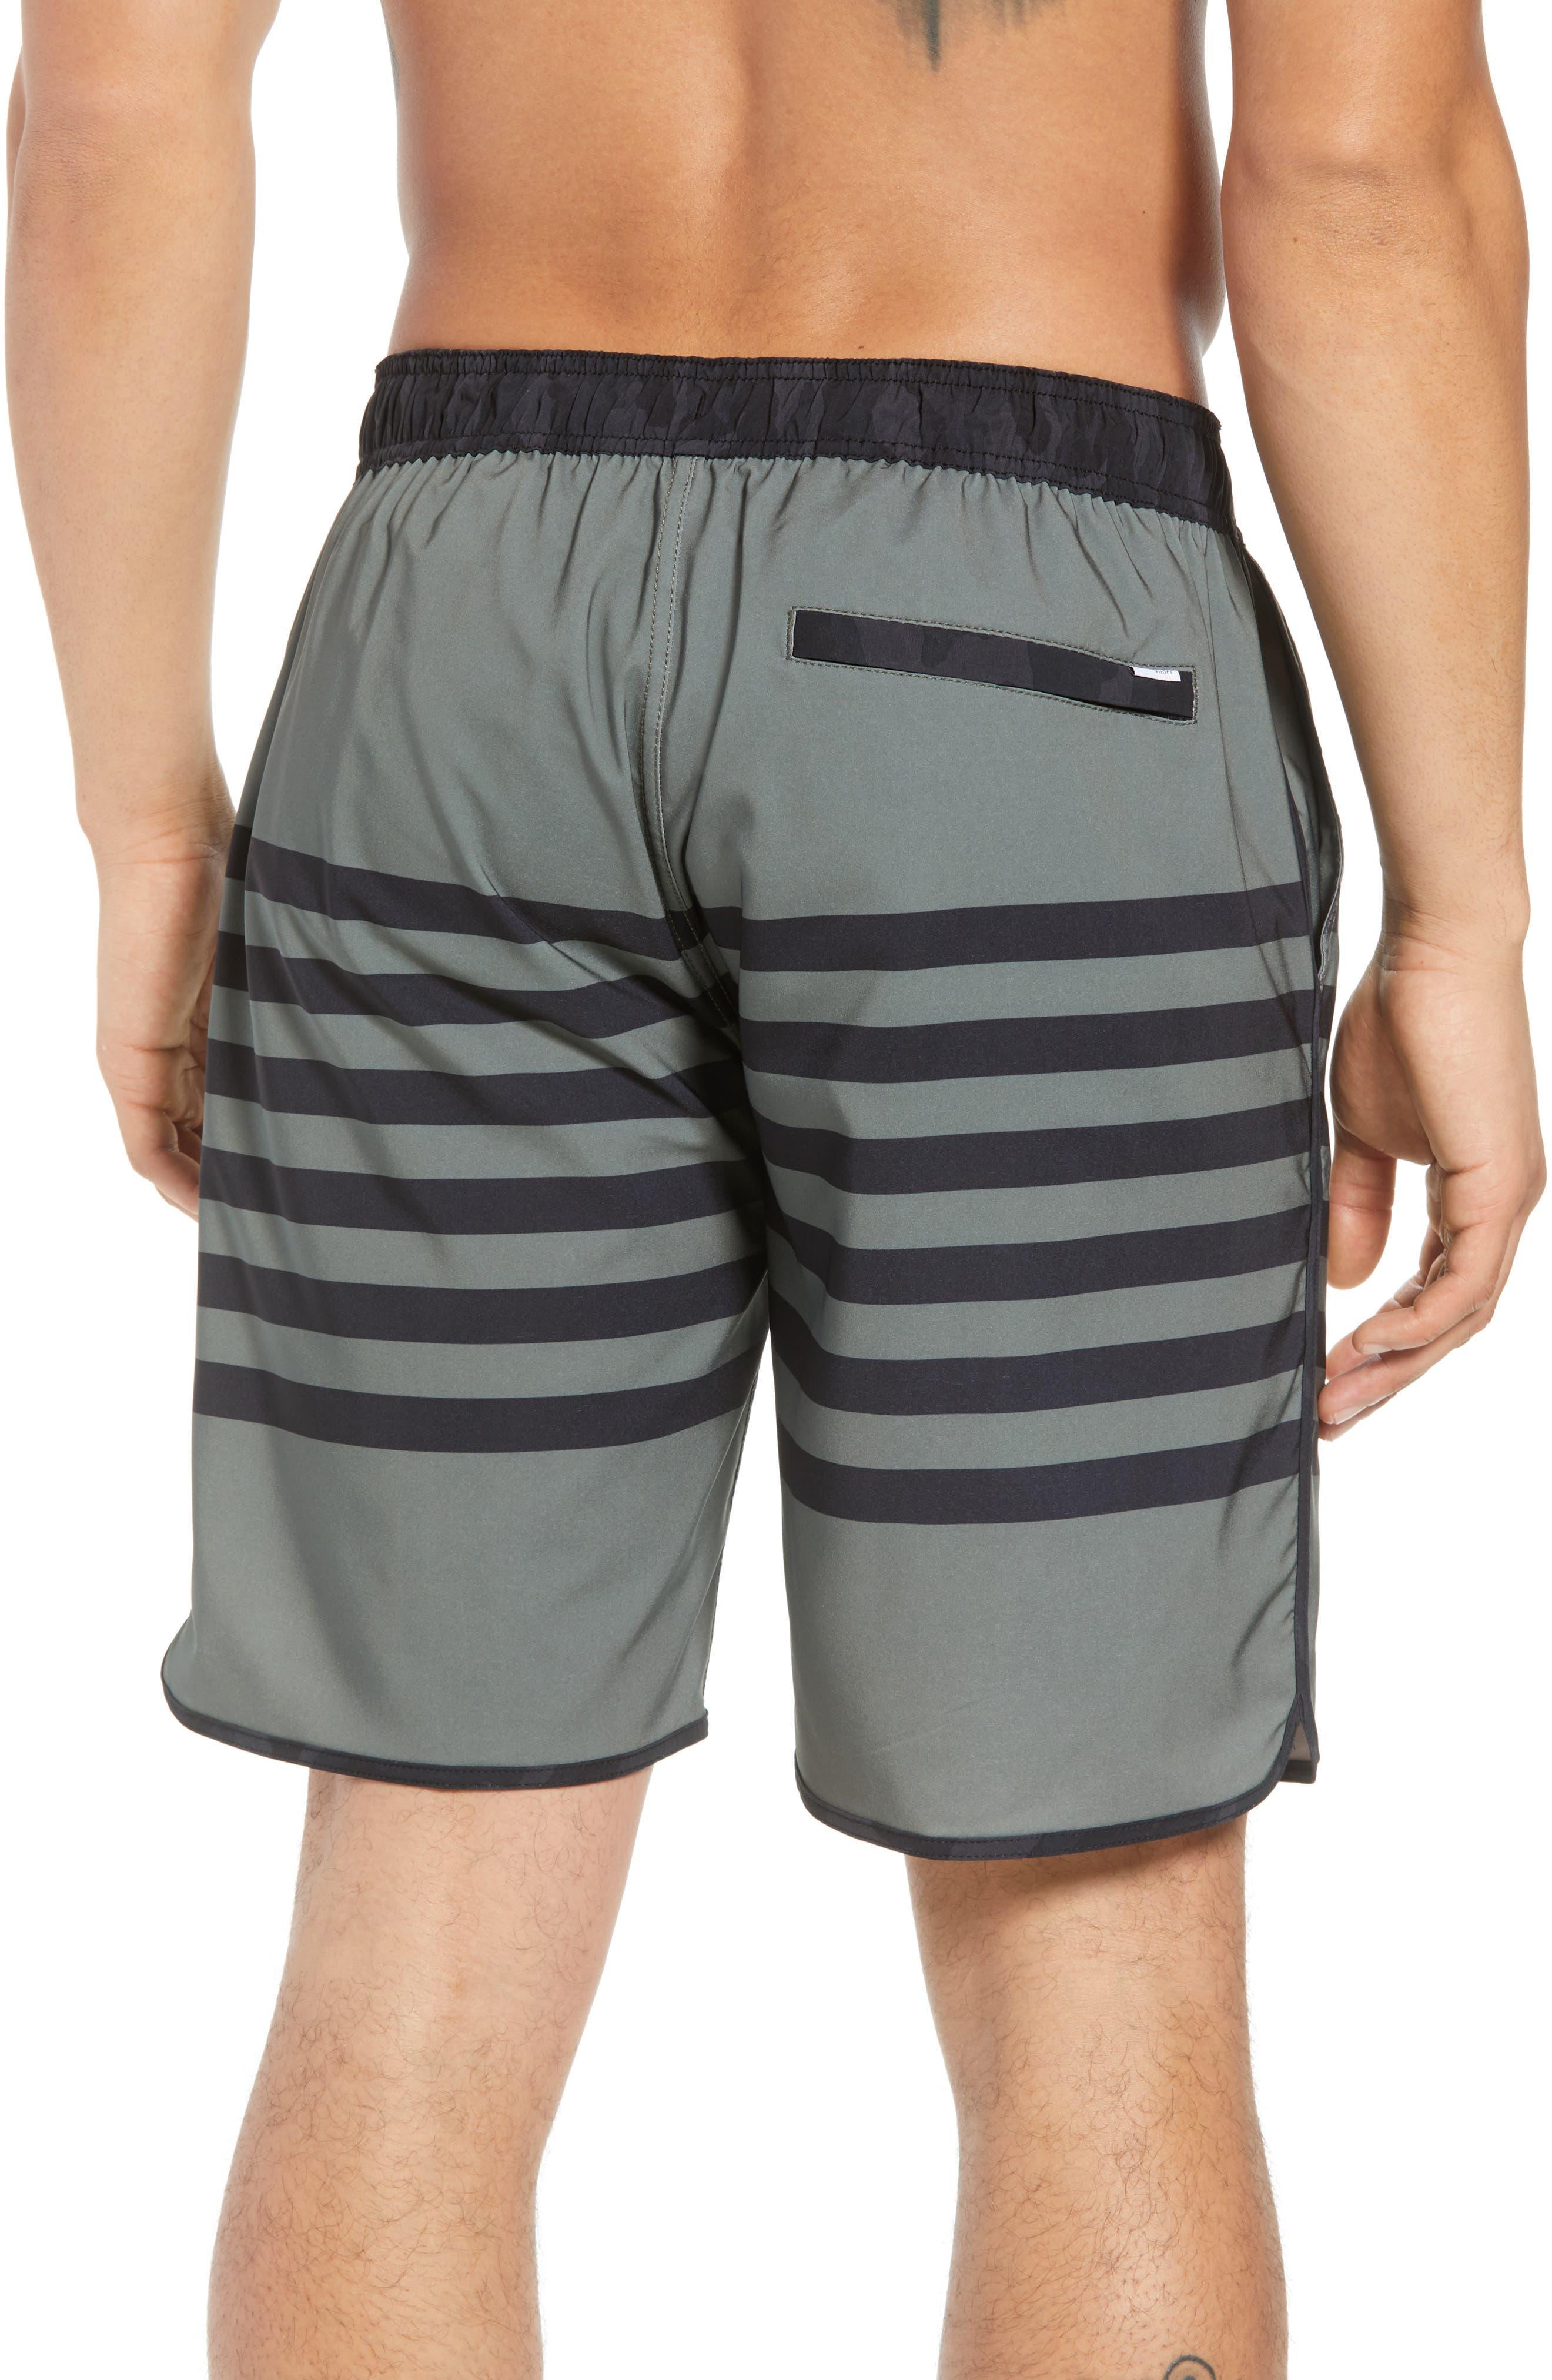 Banks Shorts,                             Alternate thumbnail 2, color,                             Army Stripe